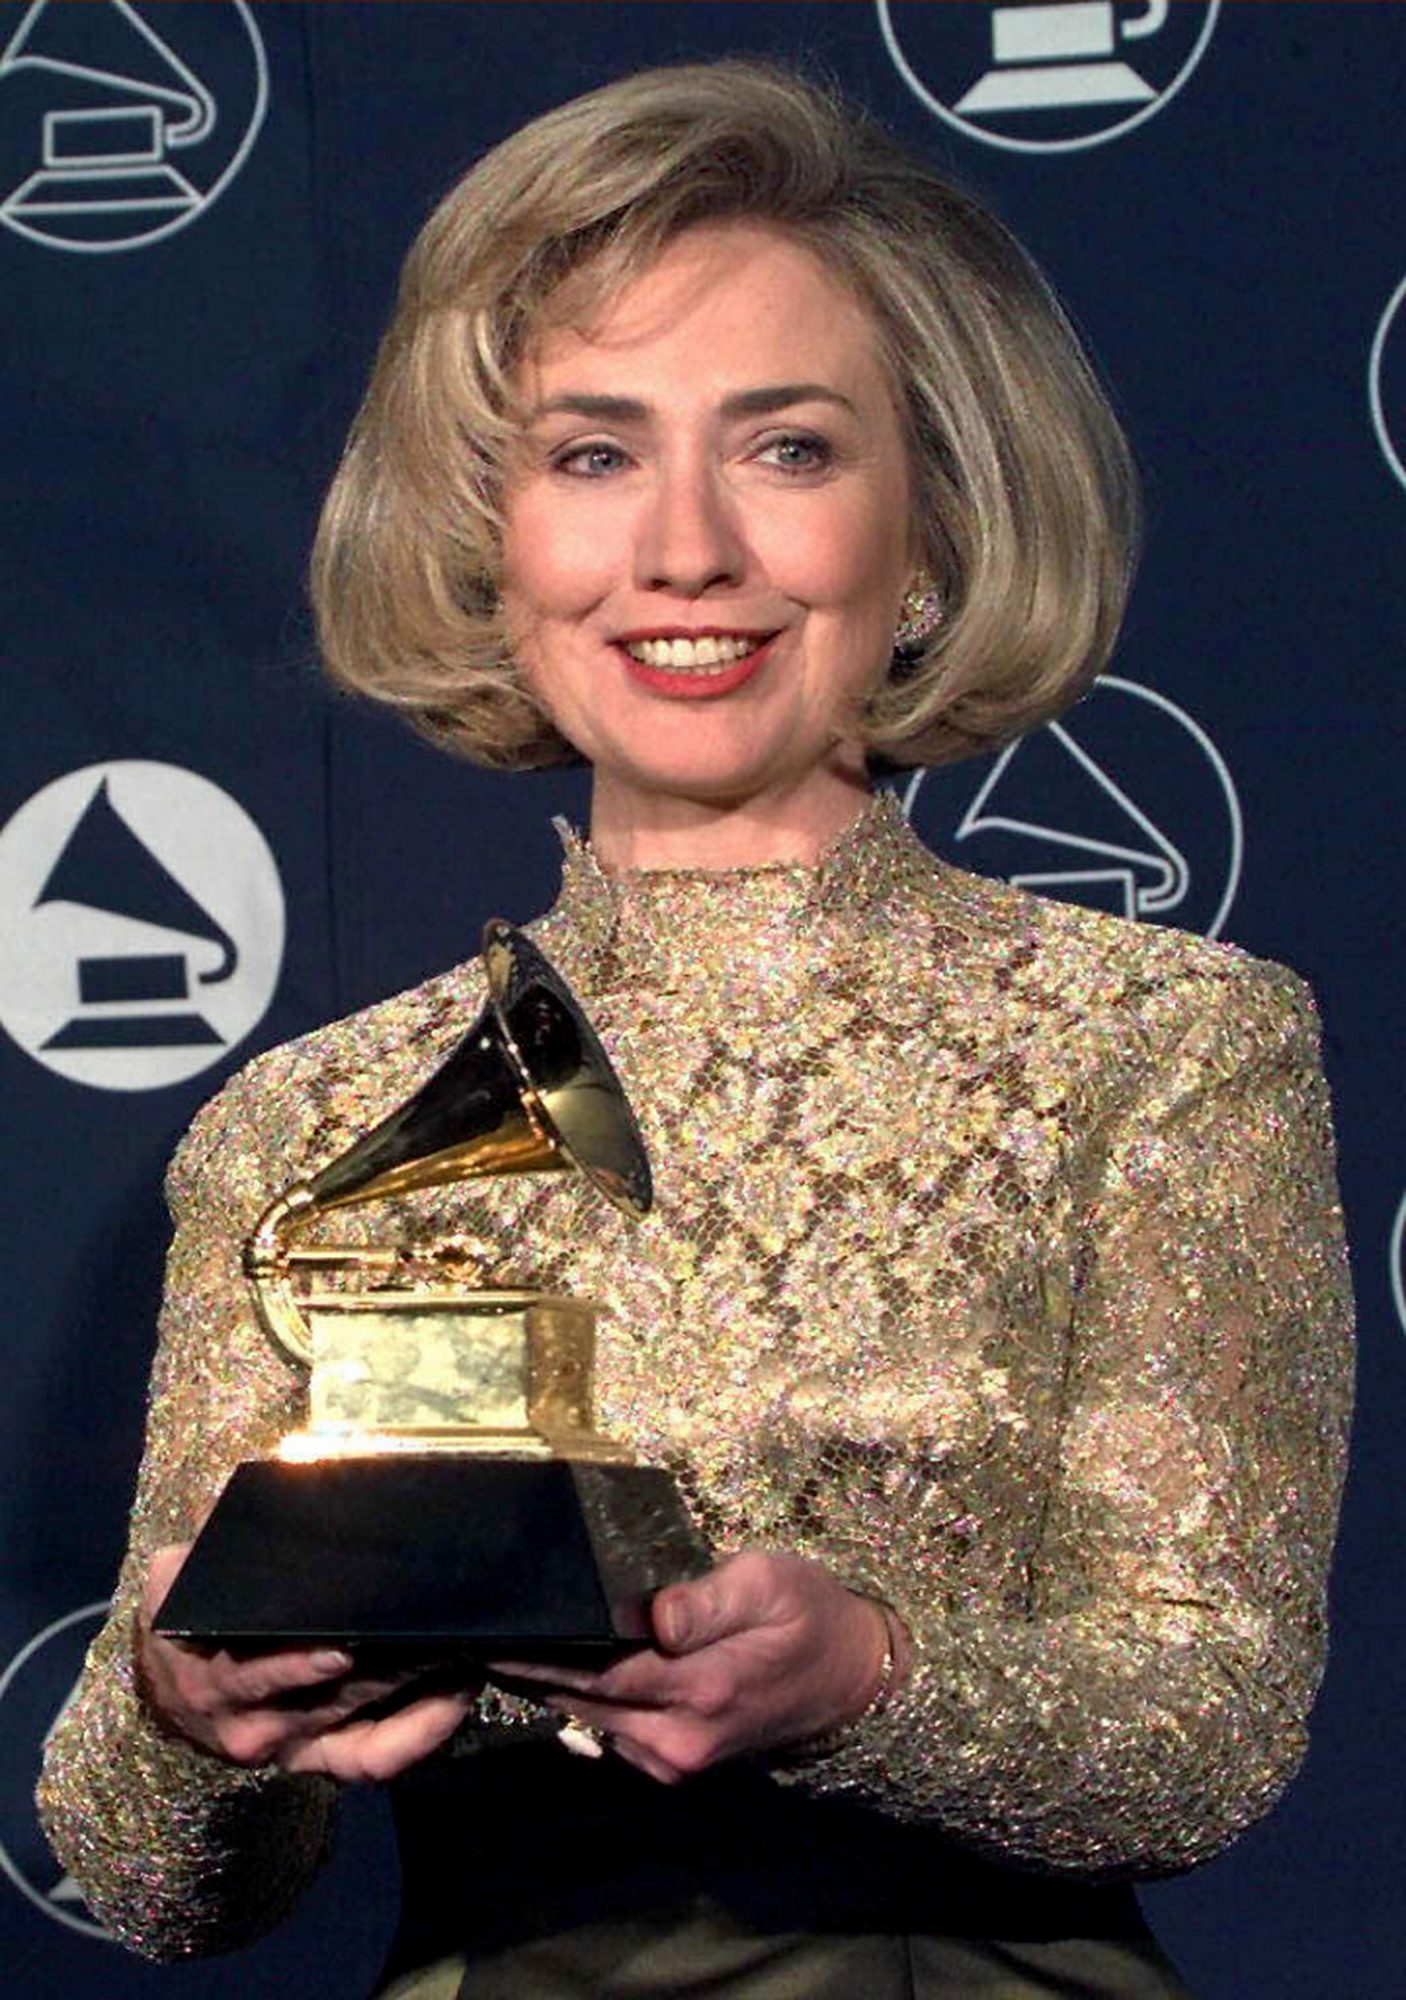 Hillary Rodham Clinton holds up her Grammy Award 2